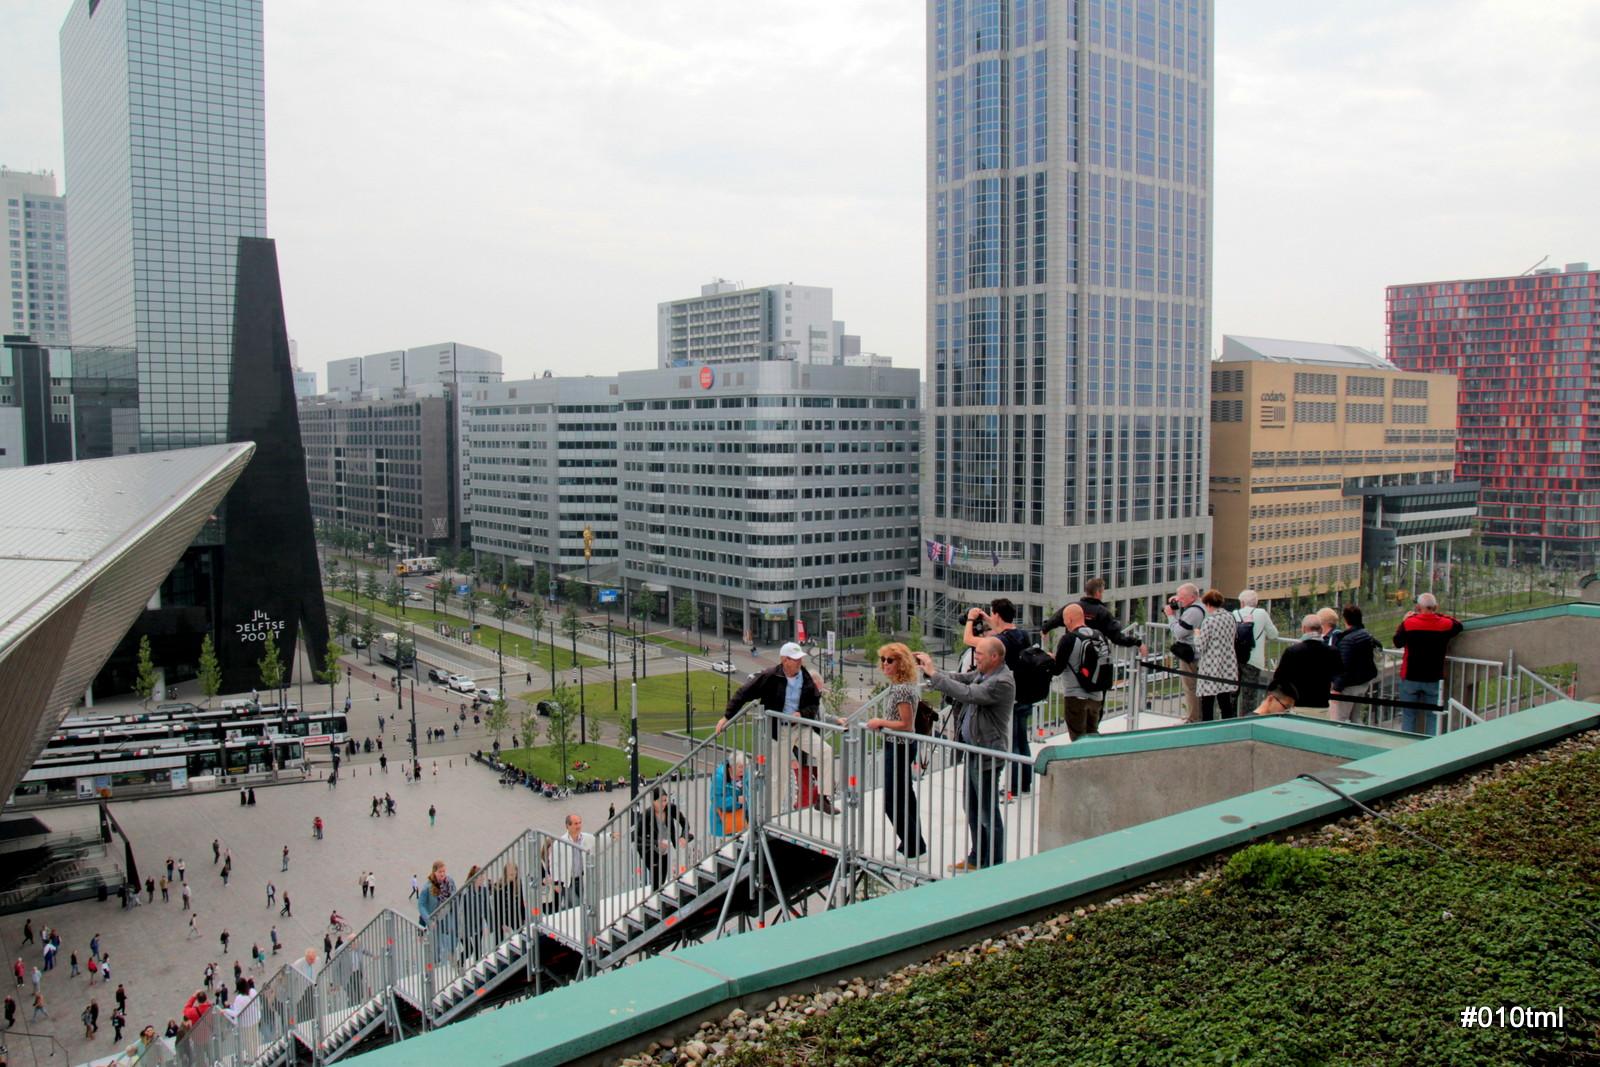 Rotterdam through my lens: rondje rotterdam vanaf het dak